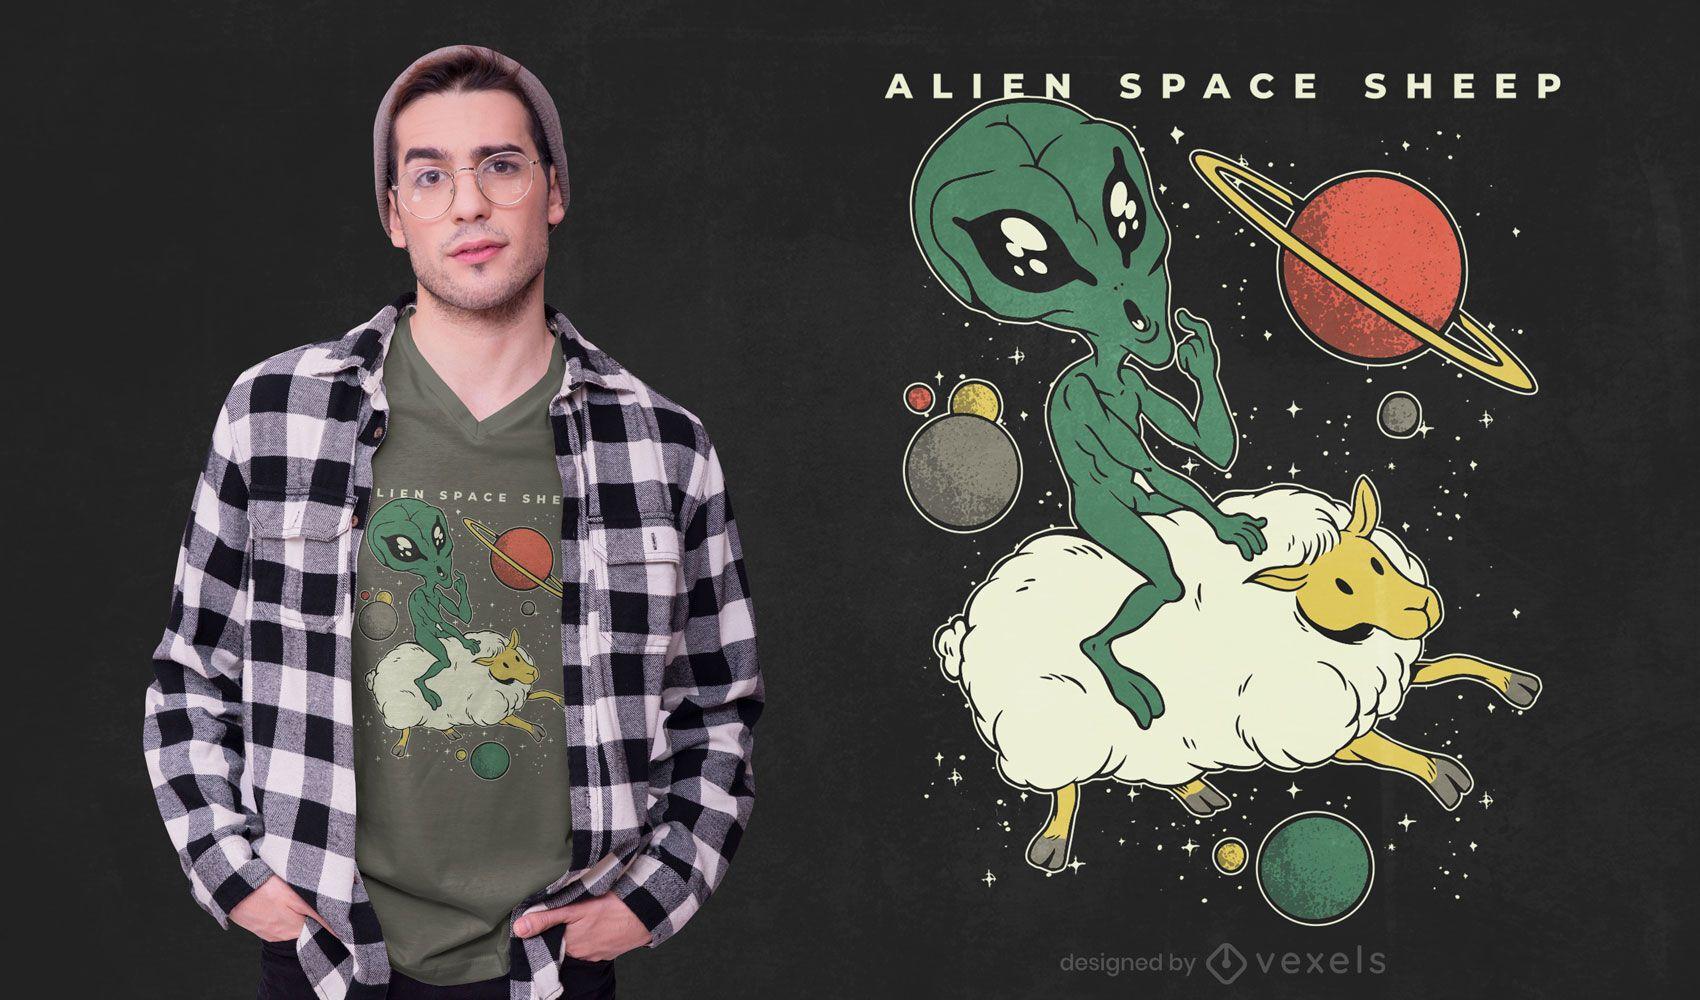 Alien space sheep t-shirt design